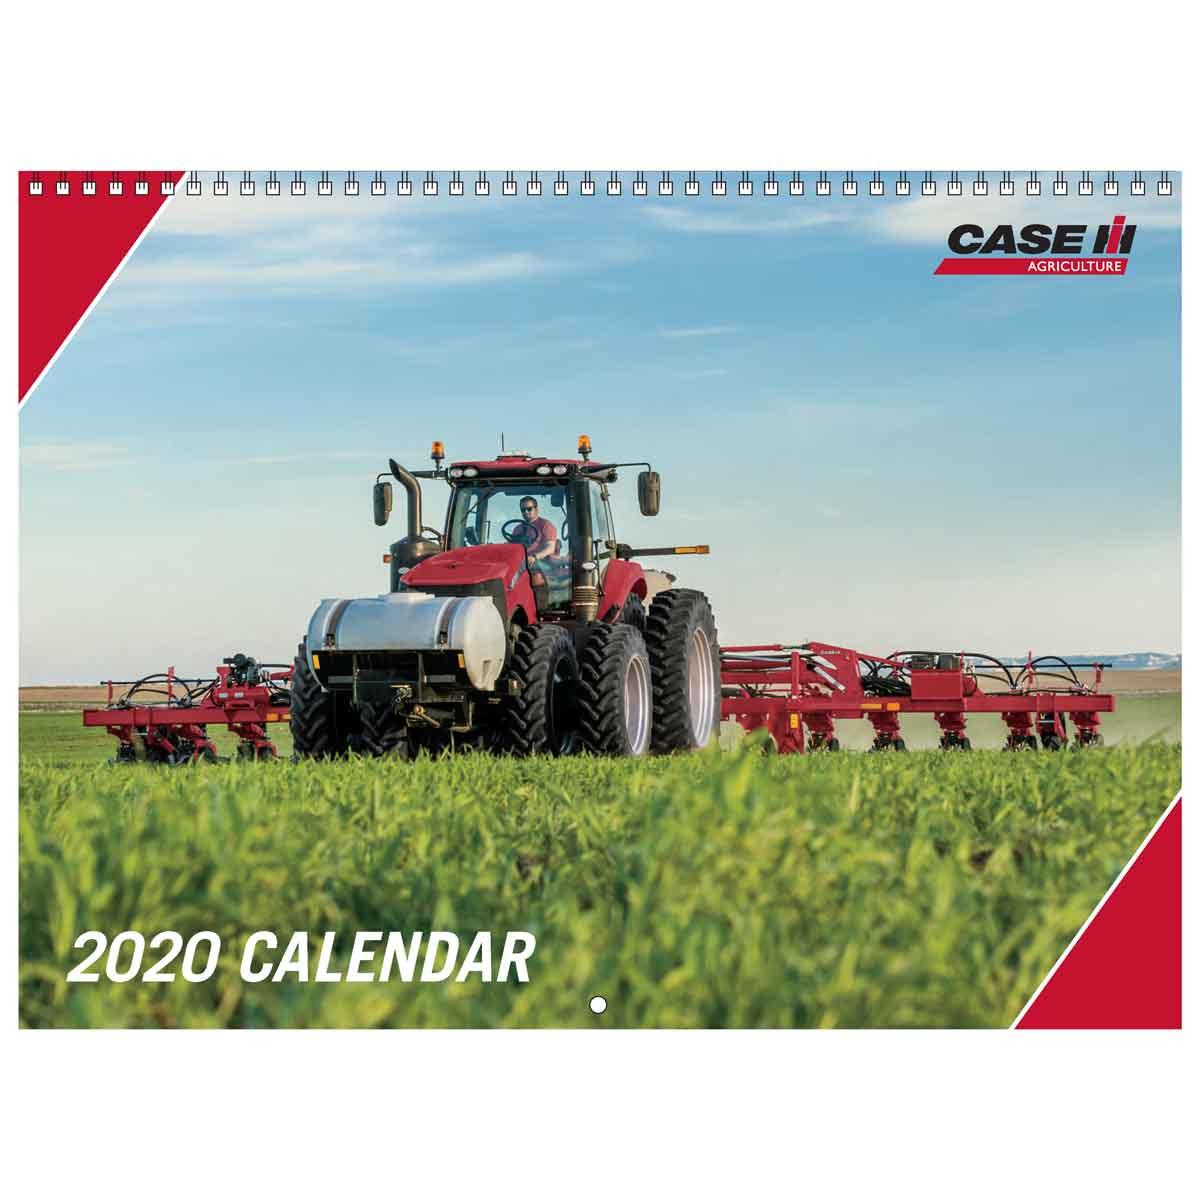 Sm 2020 Case Ih 2020 12 Month Wall Calendar 12 X 12